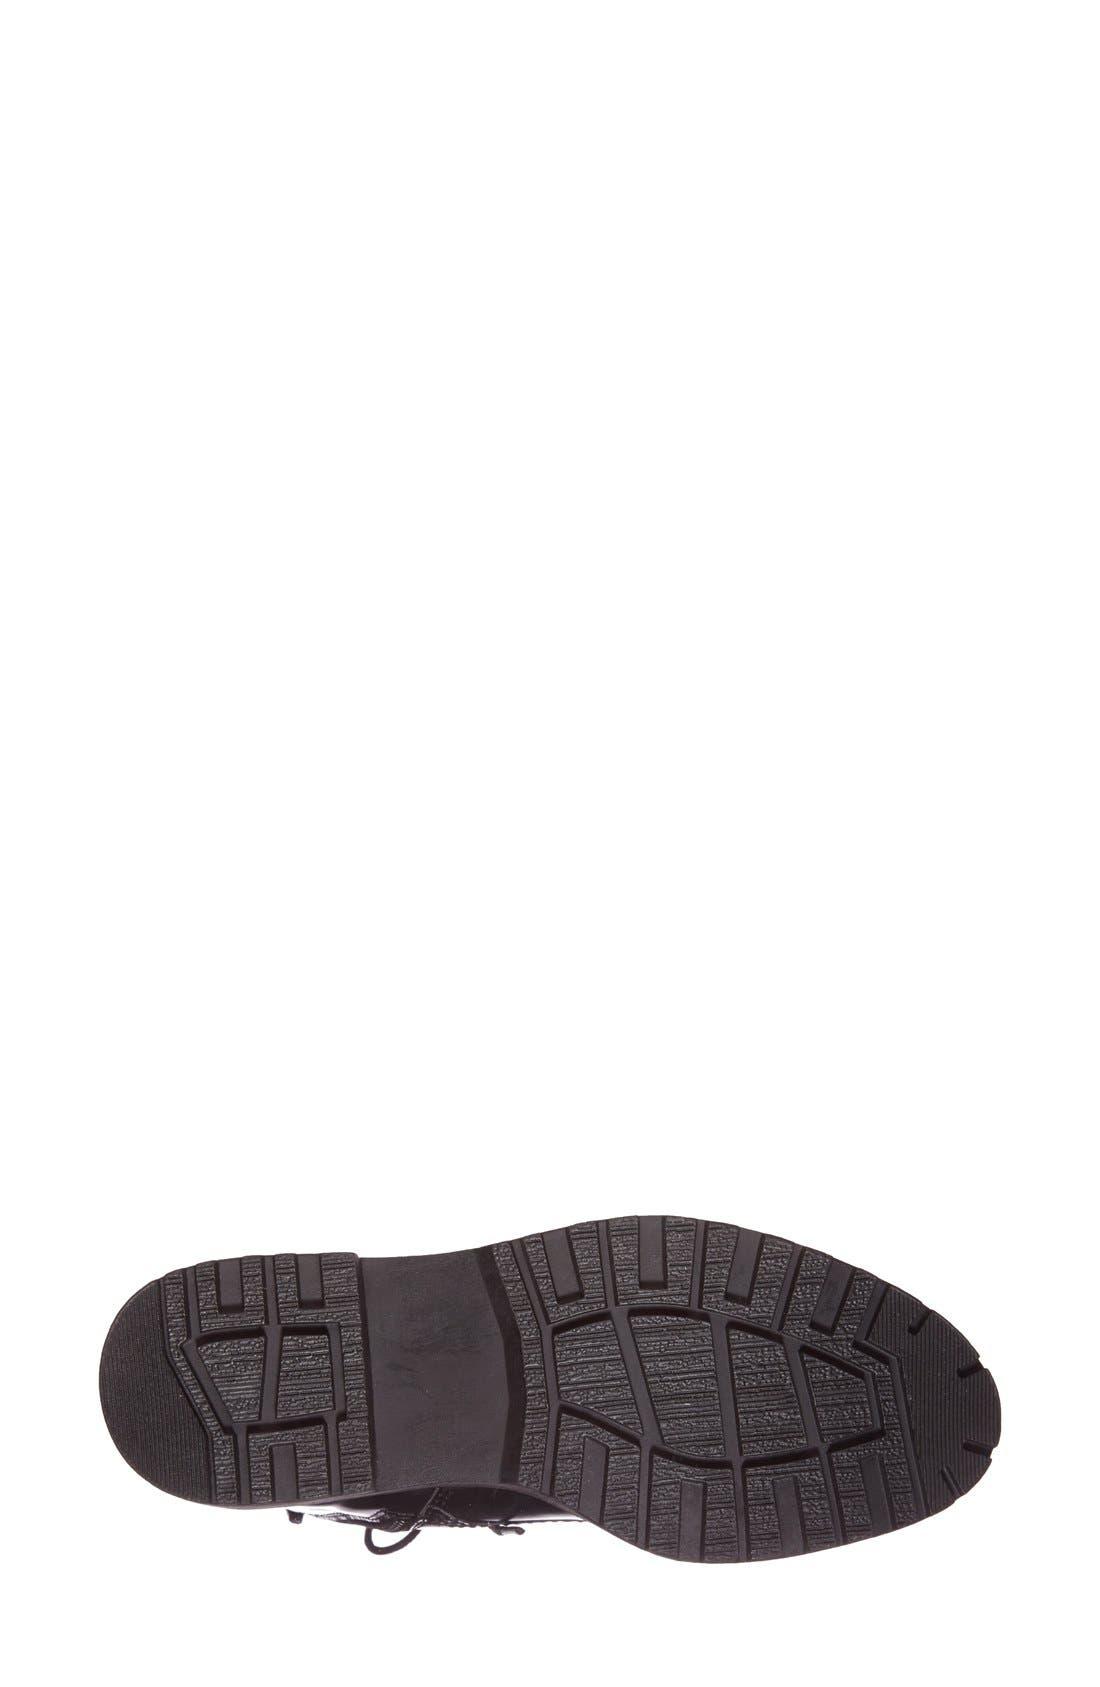 'Finnick' Boot,                             Alternate thumbnail 4, color,                             Black